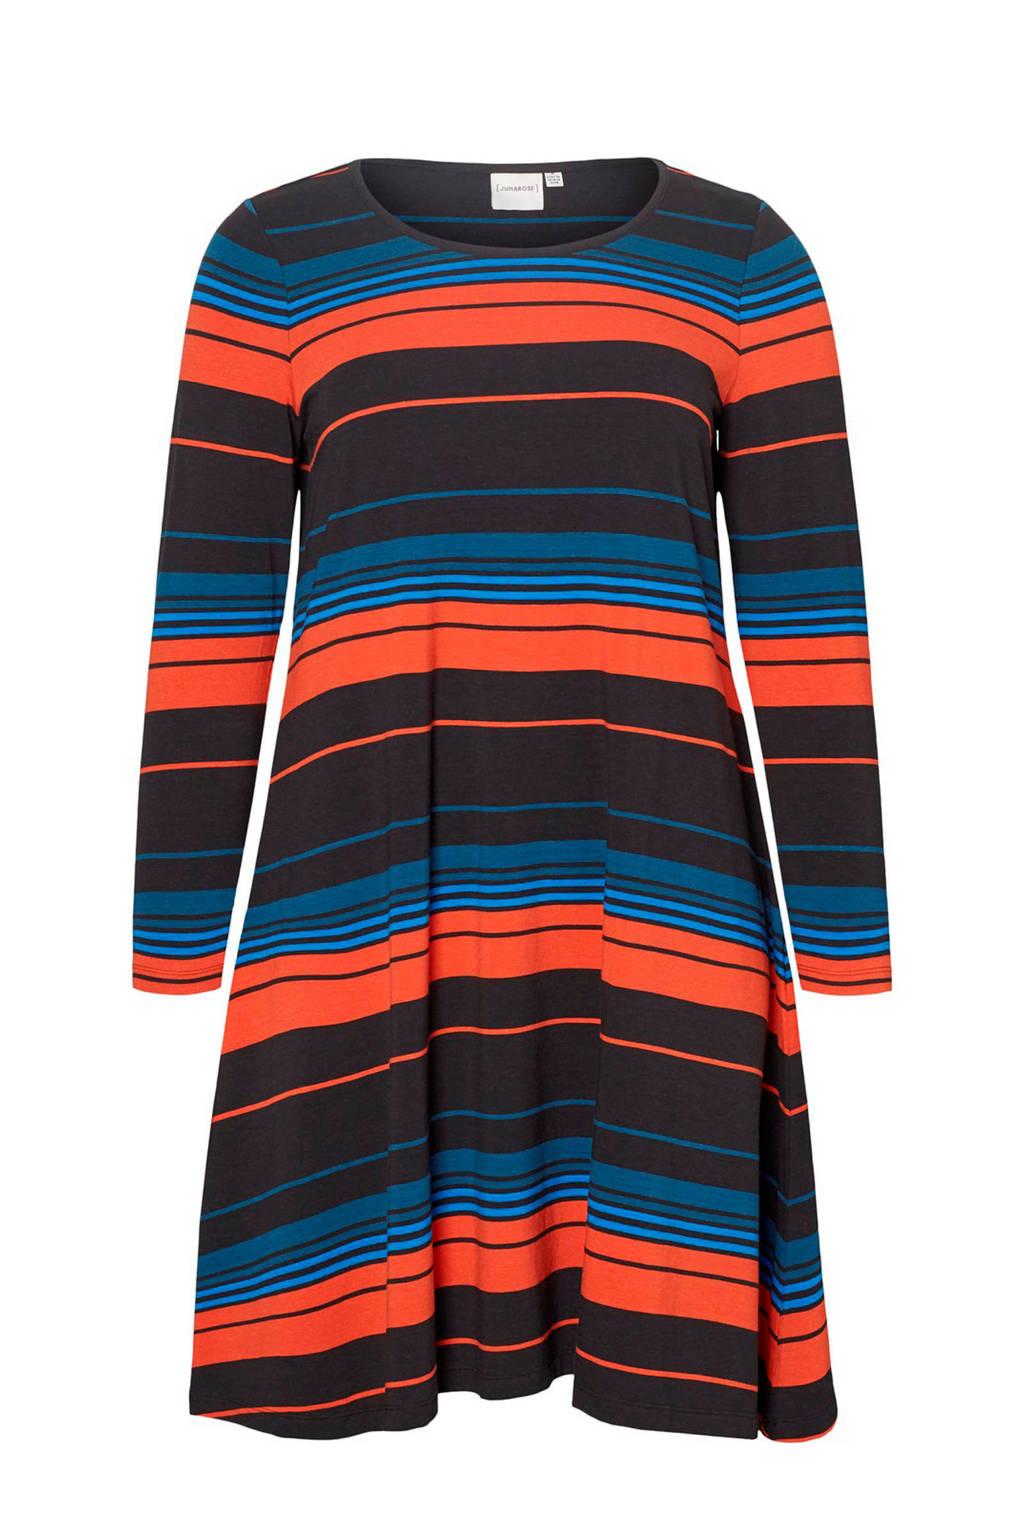 JUNAROSE gestreepte jersey jurk zwart/oranje/blauw, Zwart/oranje/blauw